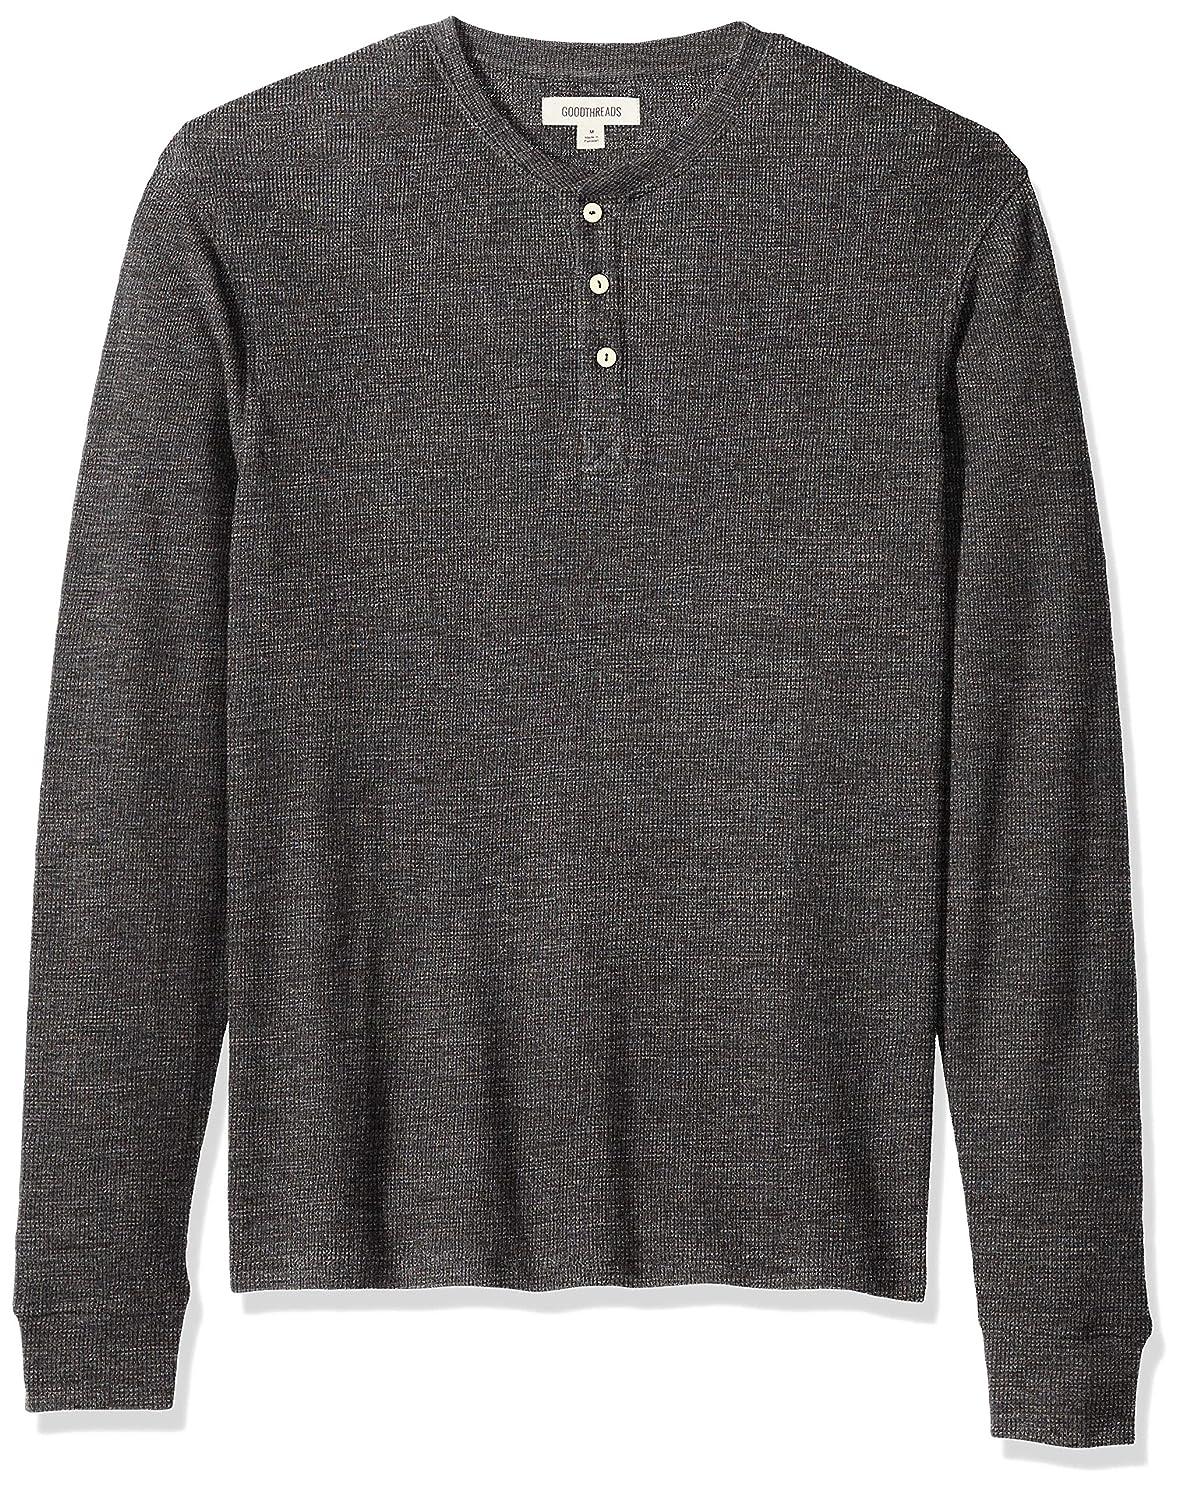 Amazon Brand - Goodthreads Men's Long-Sleeve Slub Thermal Henley